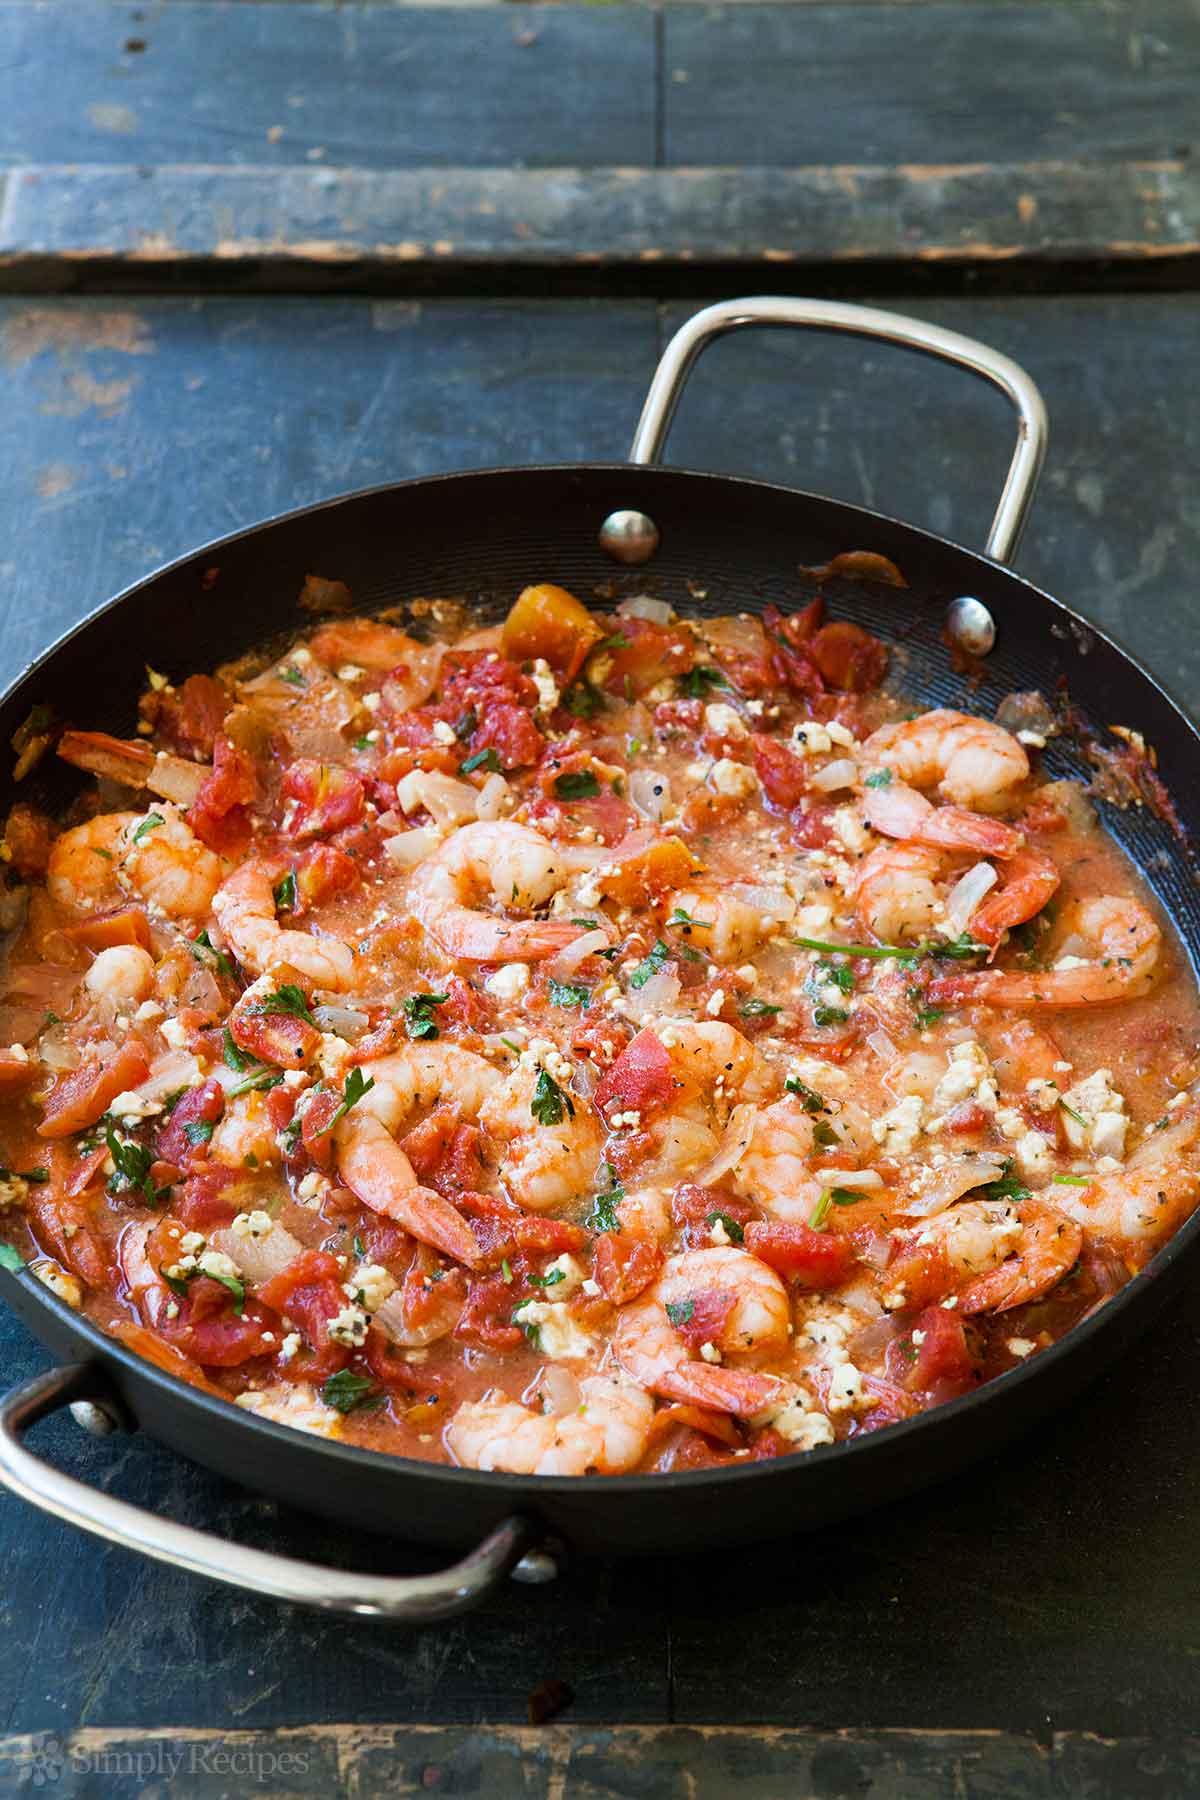 BAKED SHRIMP IN TOMATO FETA SAUCE LOW CARB DINNER RECIPE